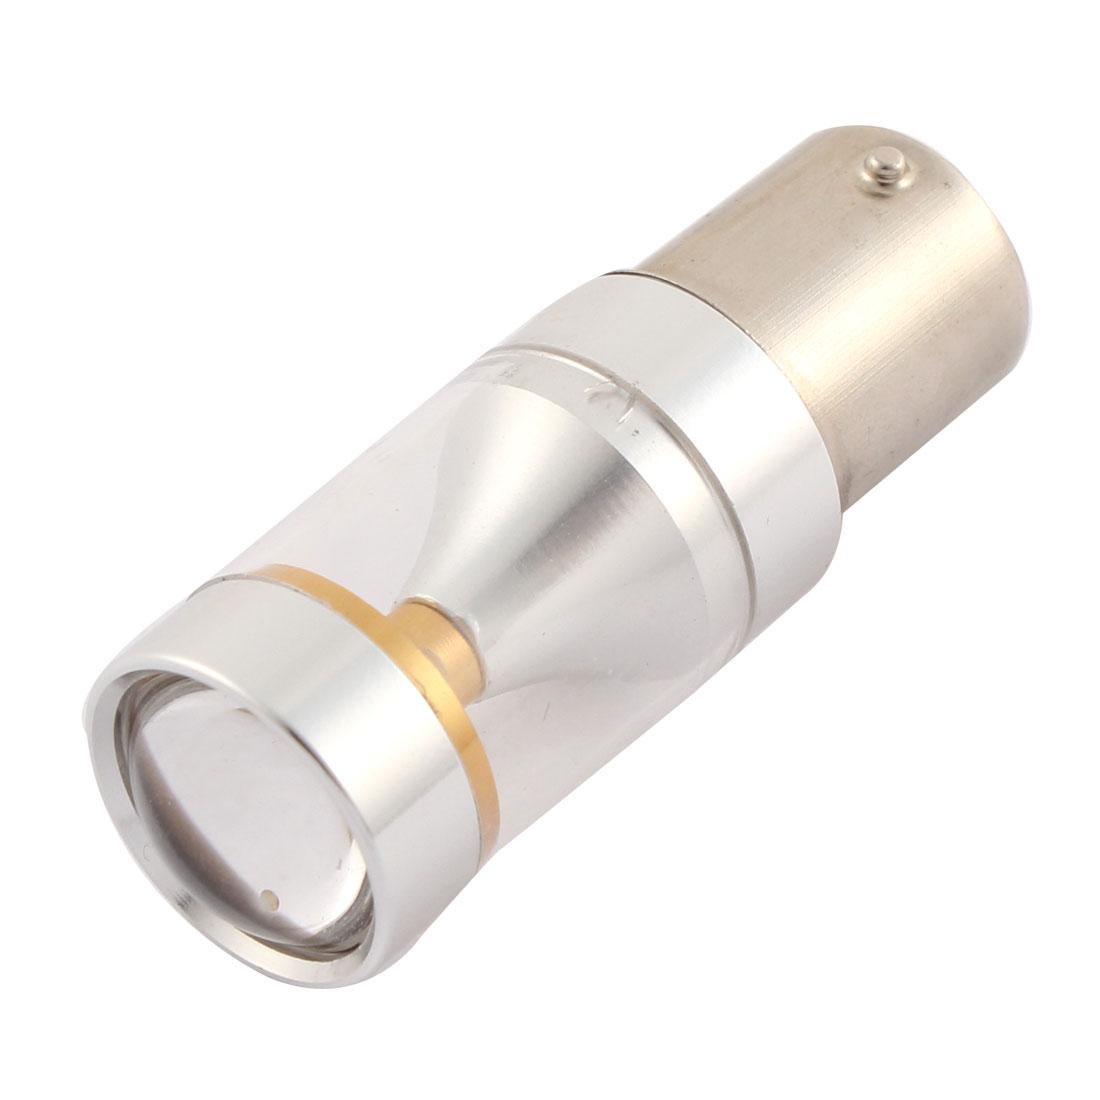 Auto Car White LED 1156 BAU15S Brake Turn Light Lamp 30W DC 12V